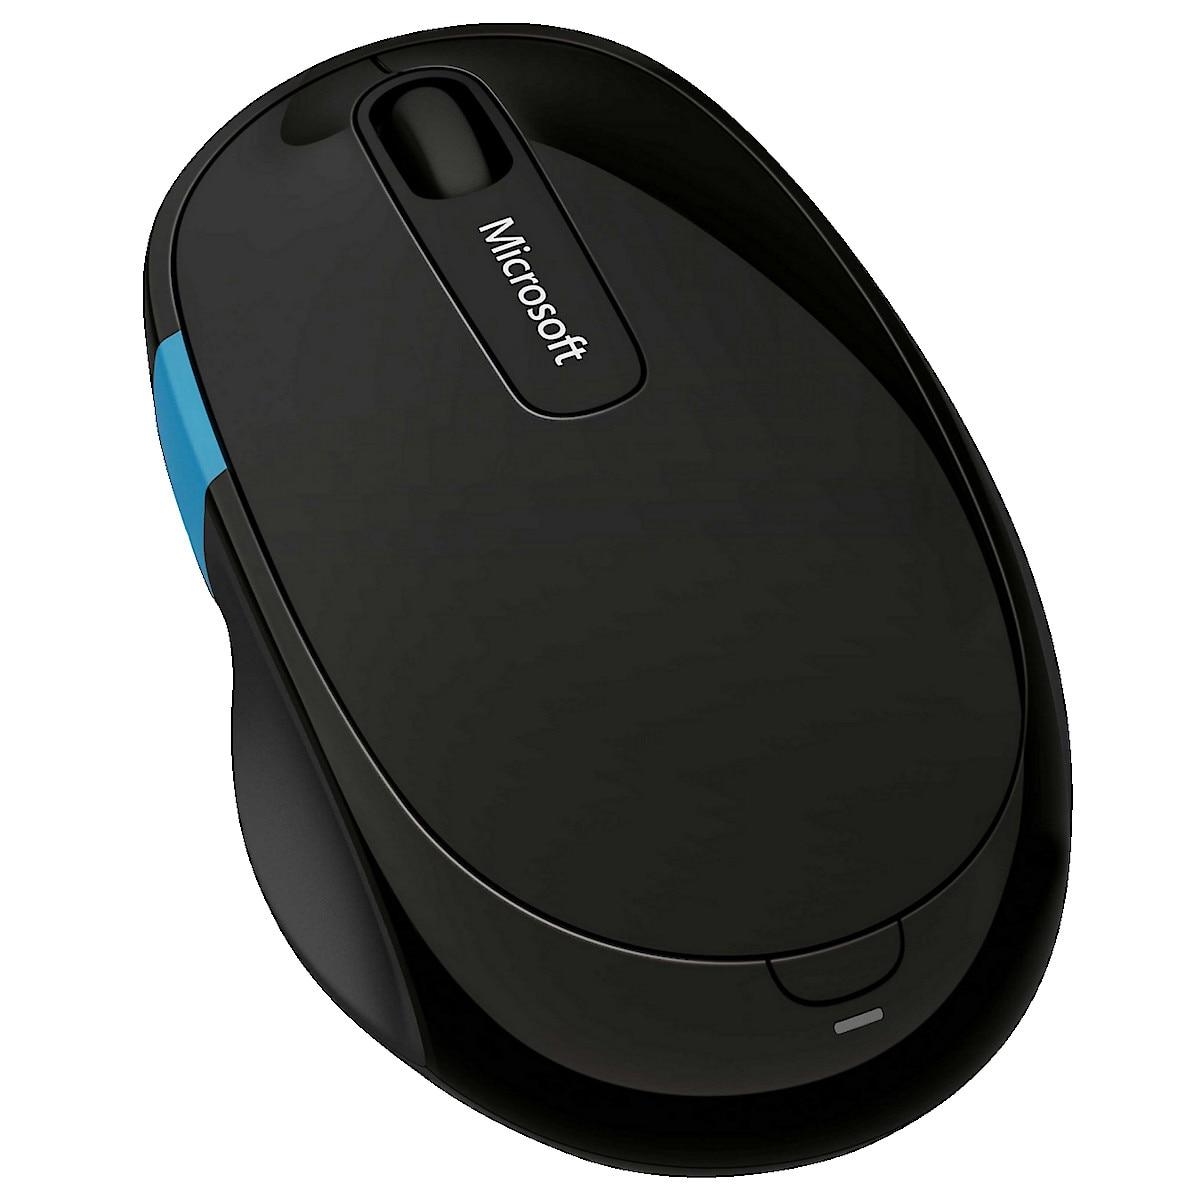 Trådlös Bluetooth-mus Microsoft Sculpt Comfort Mouse